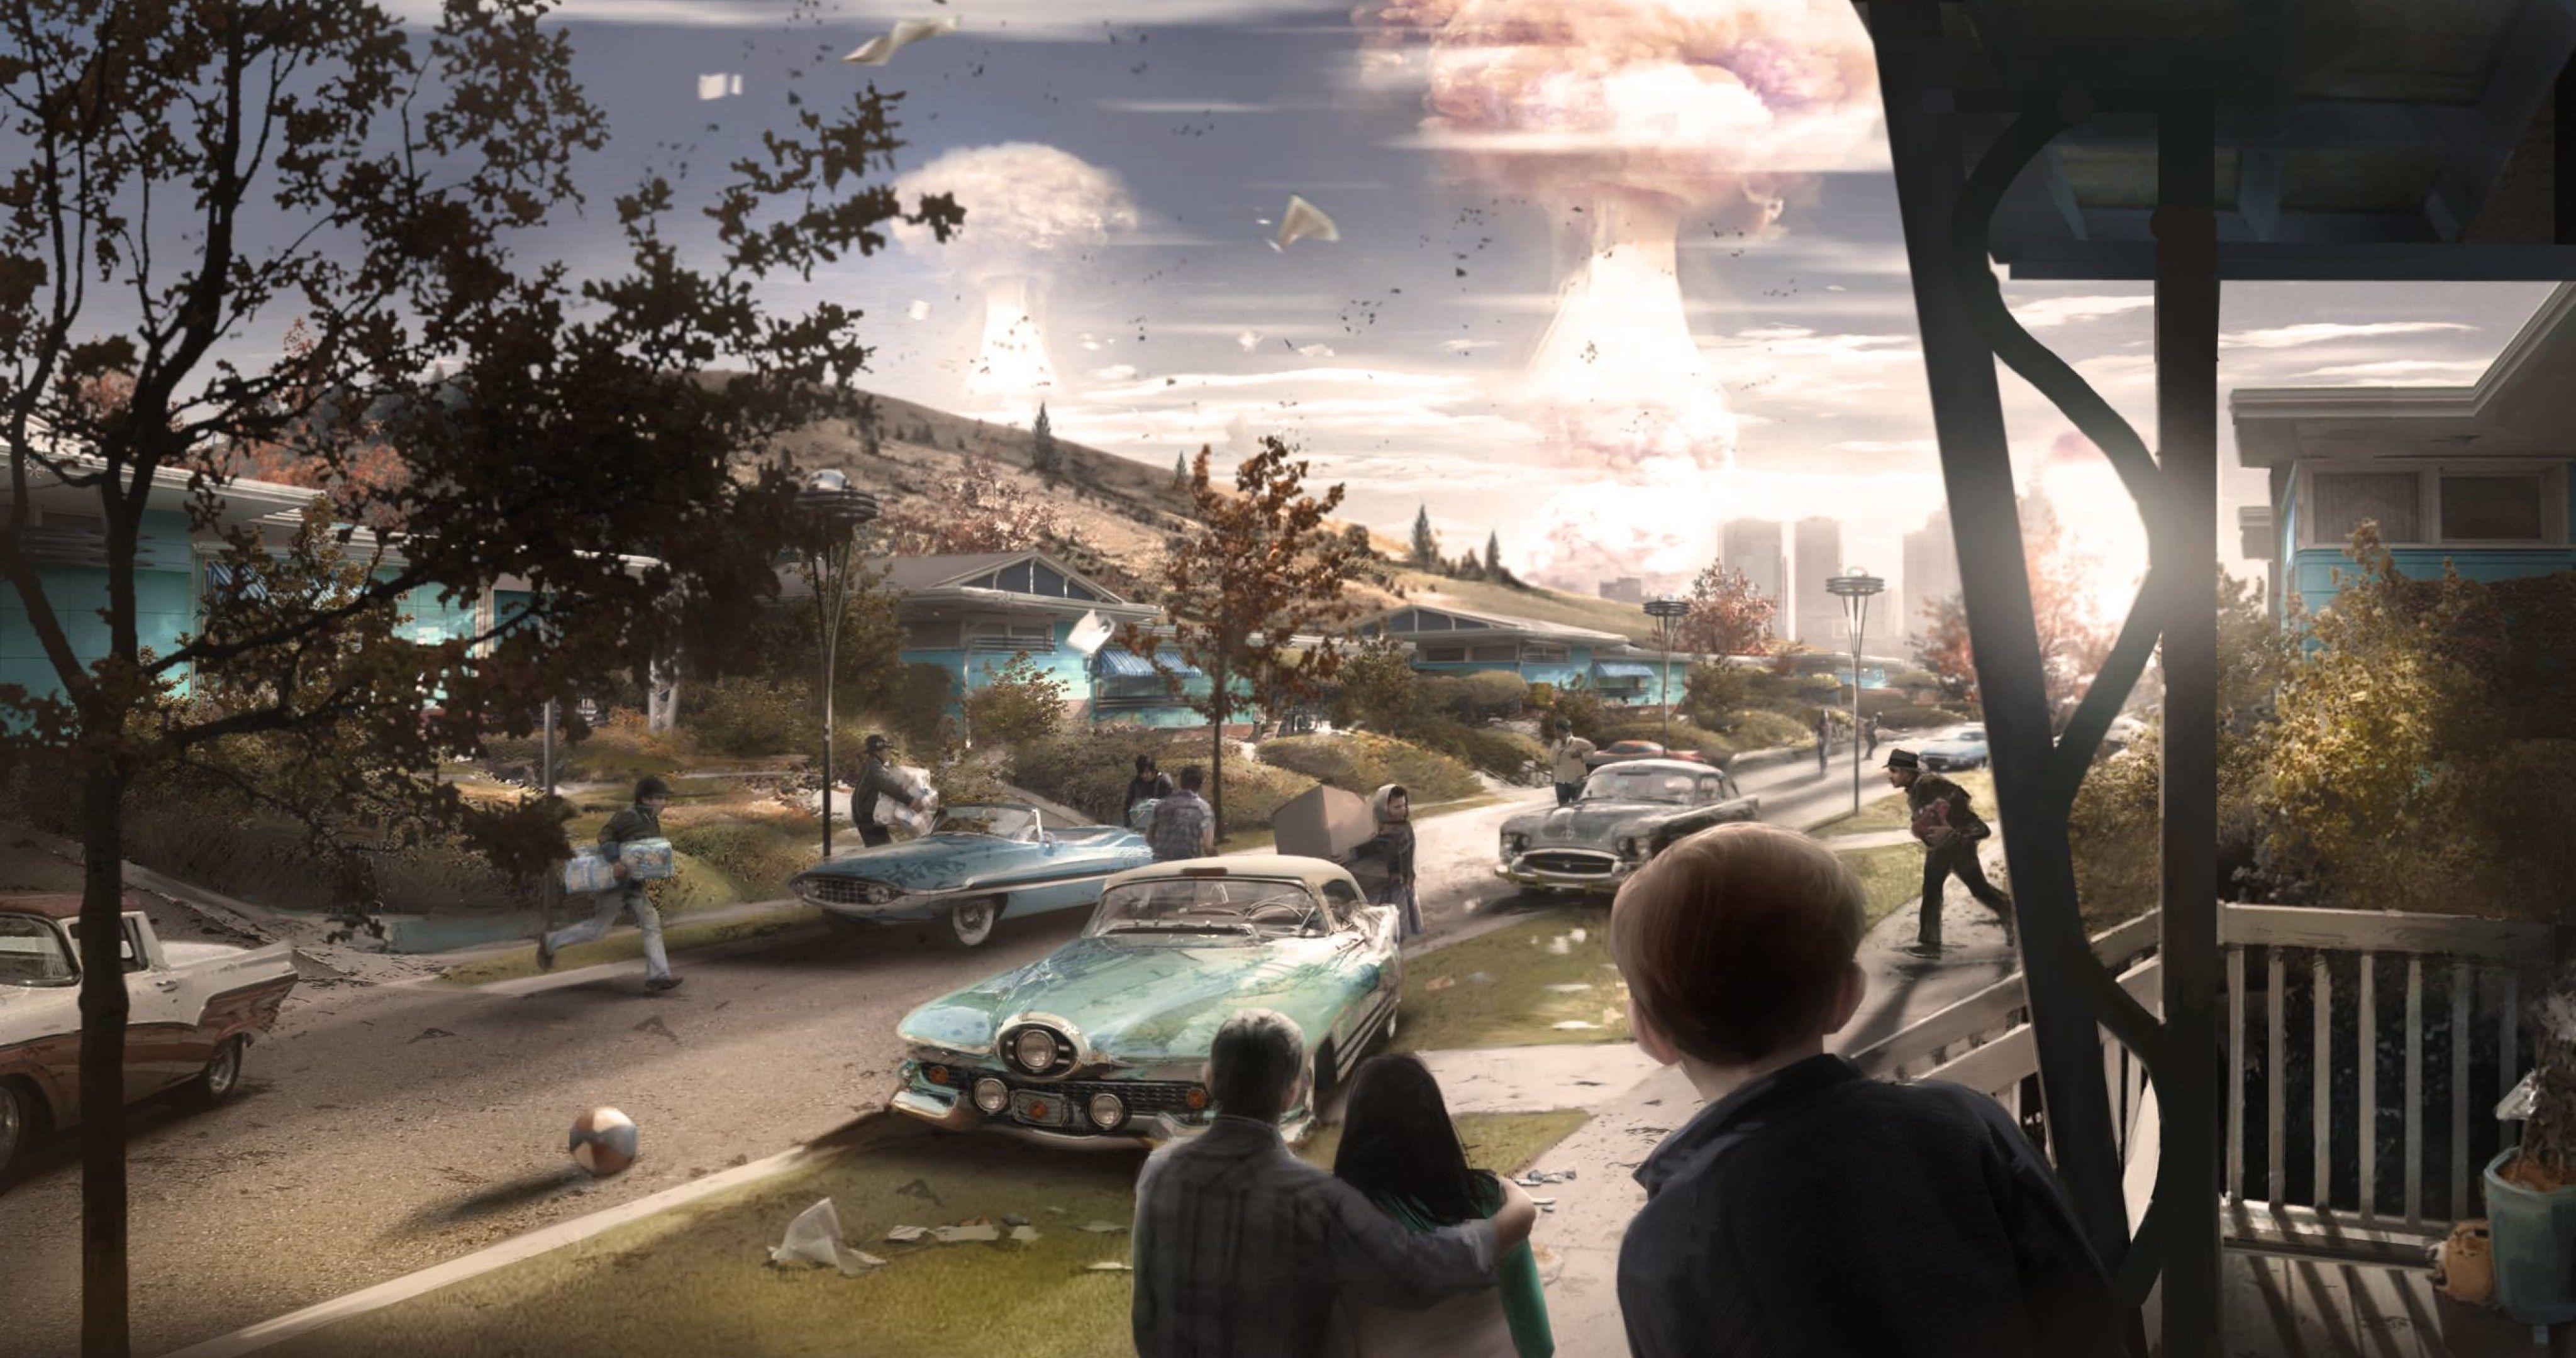 Fallout 4 Nuke Concept Art 4k Ultra Hd Wallpaper Fallout 4 Concept Art Fallout Wallpaper Fallout Concept Art